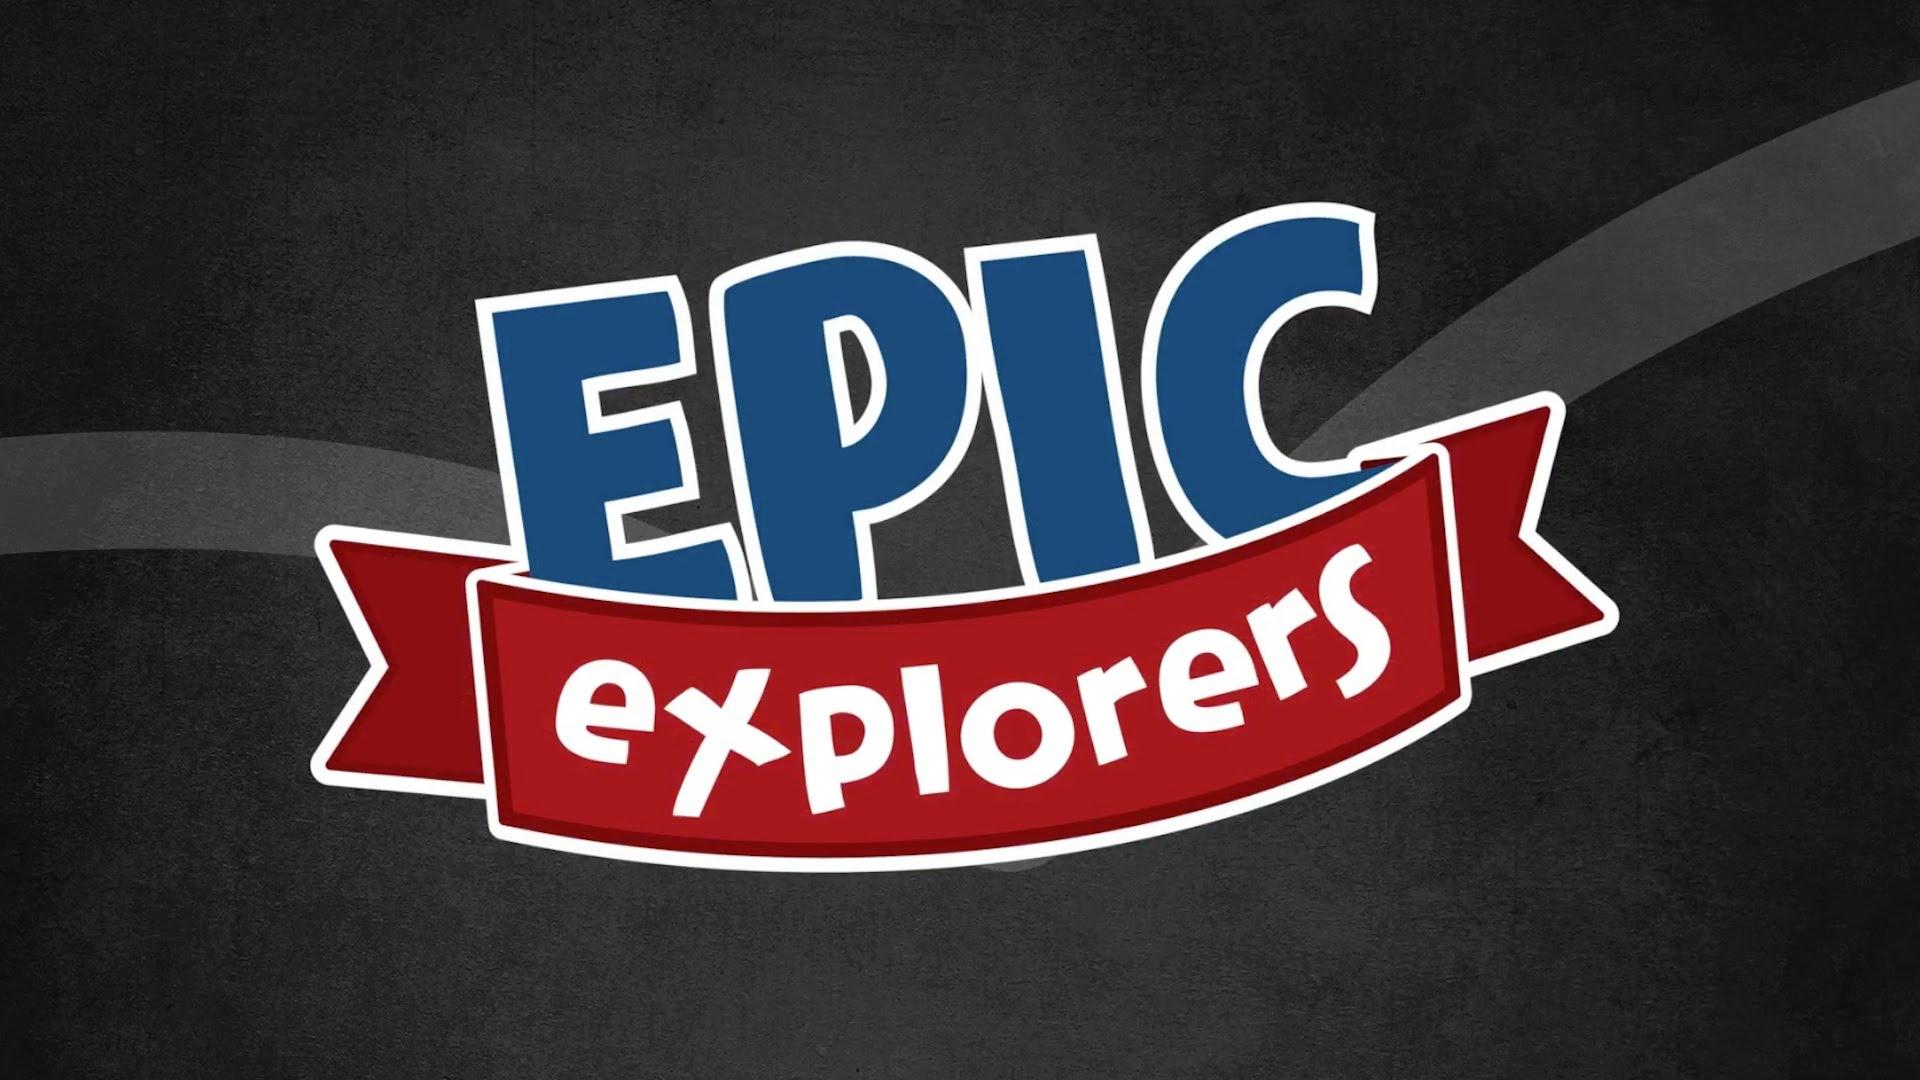 Epic explorers logo